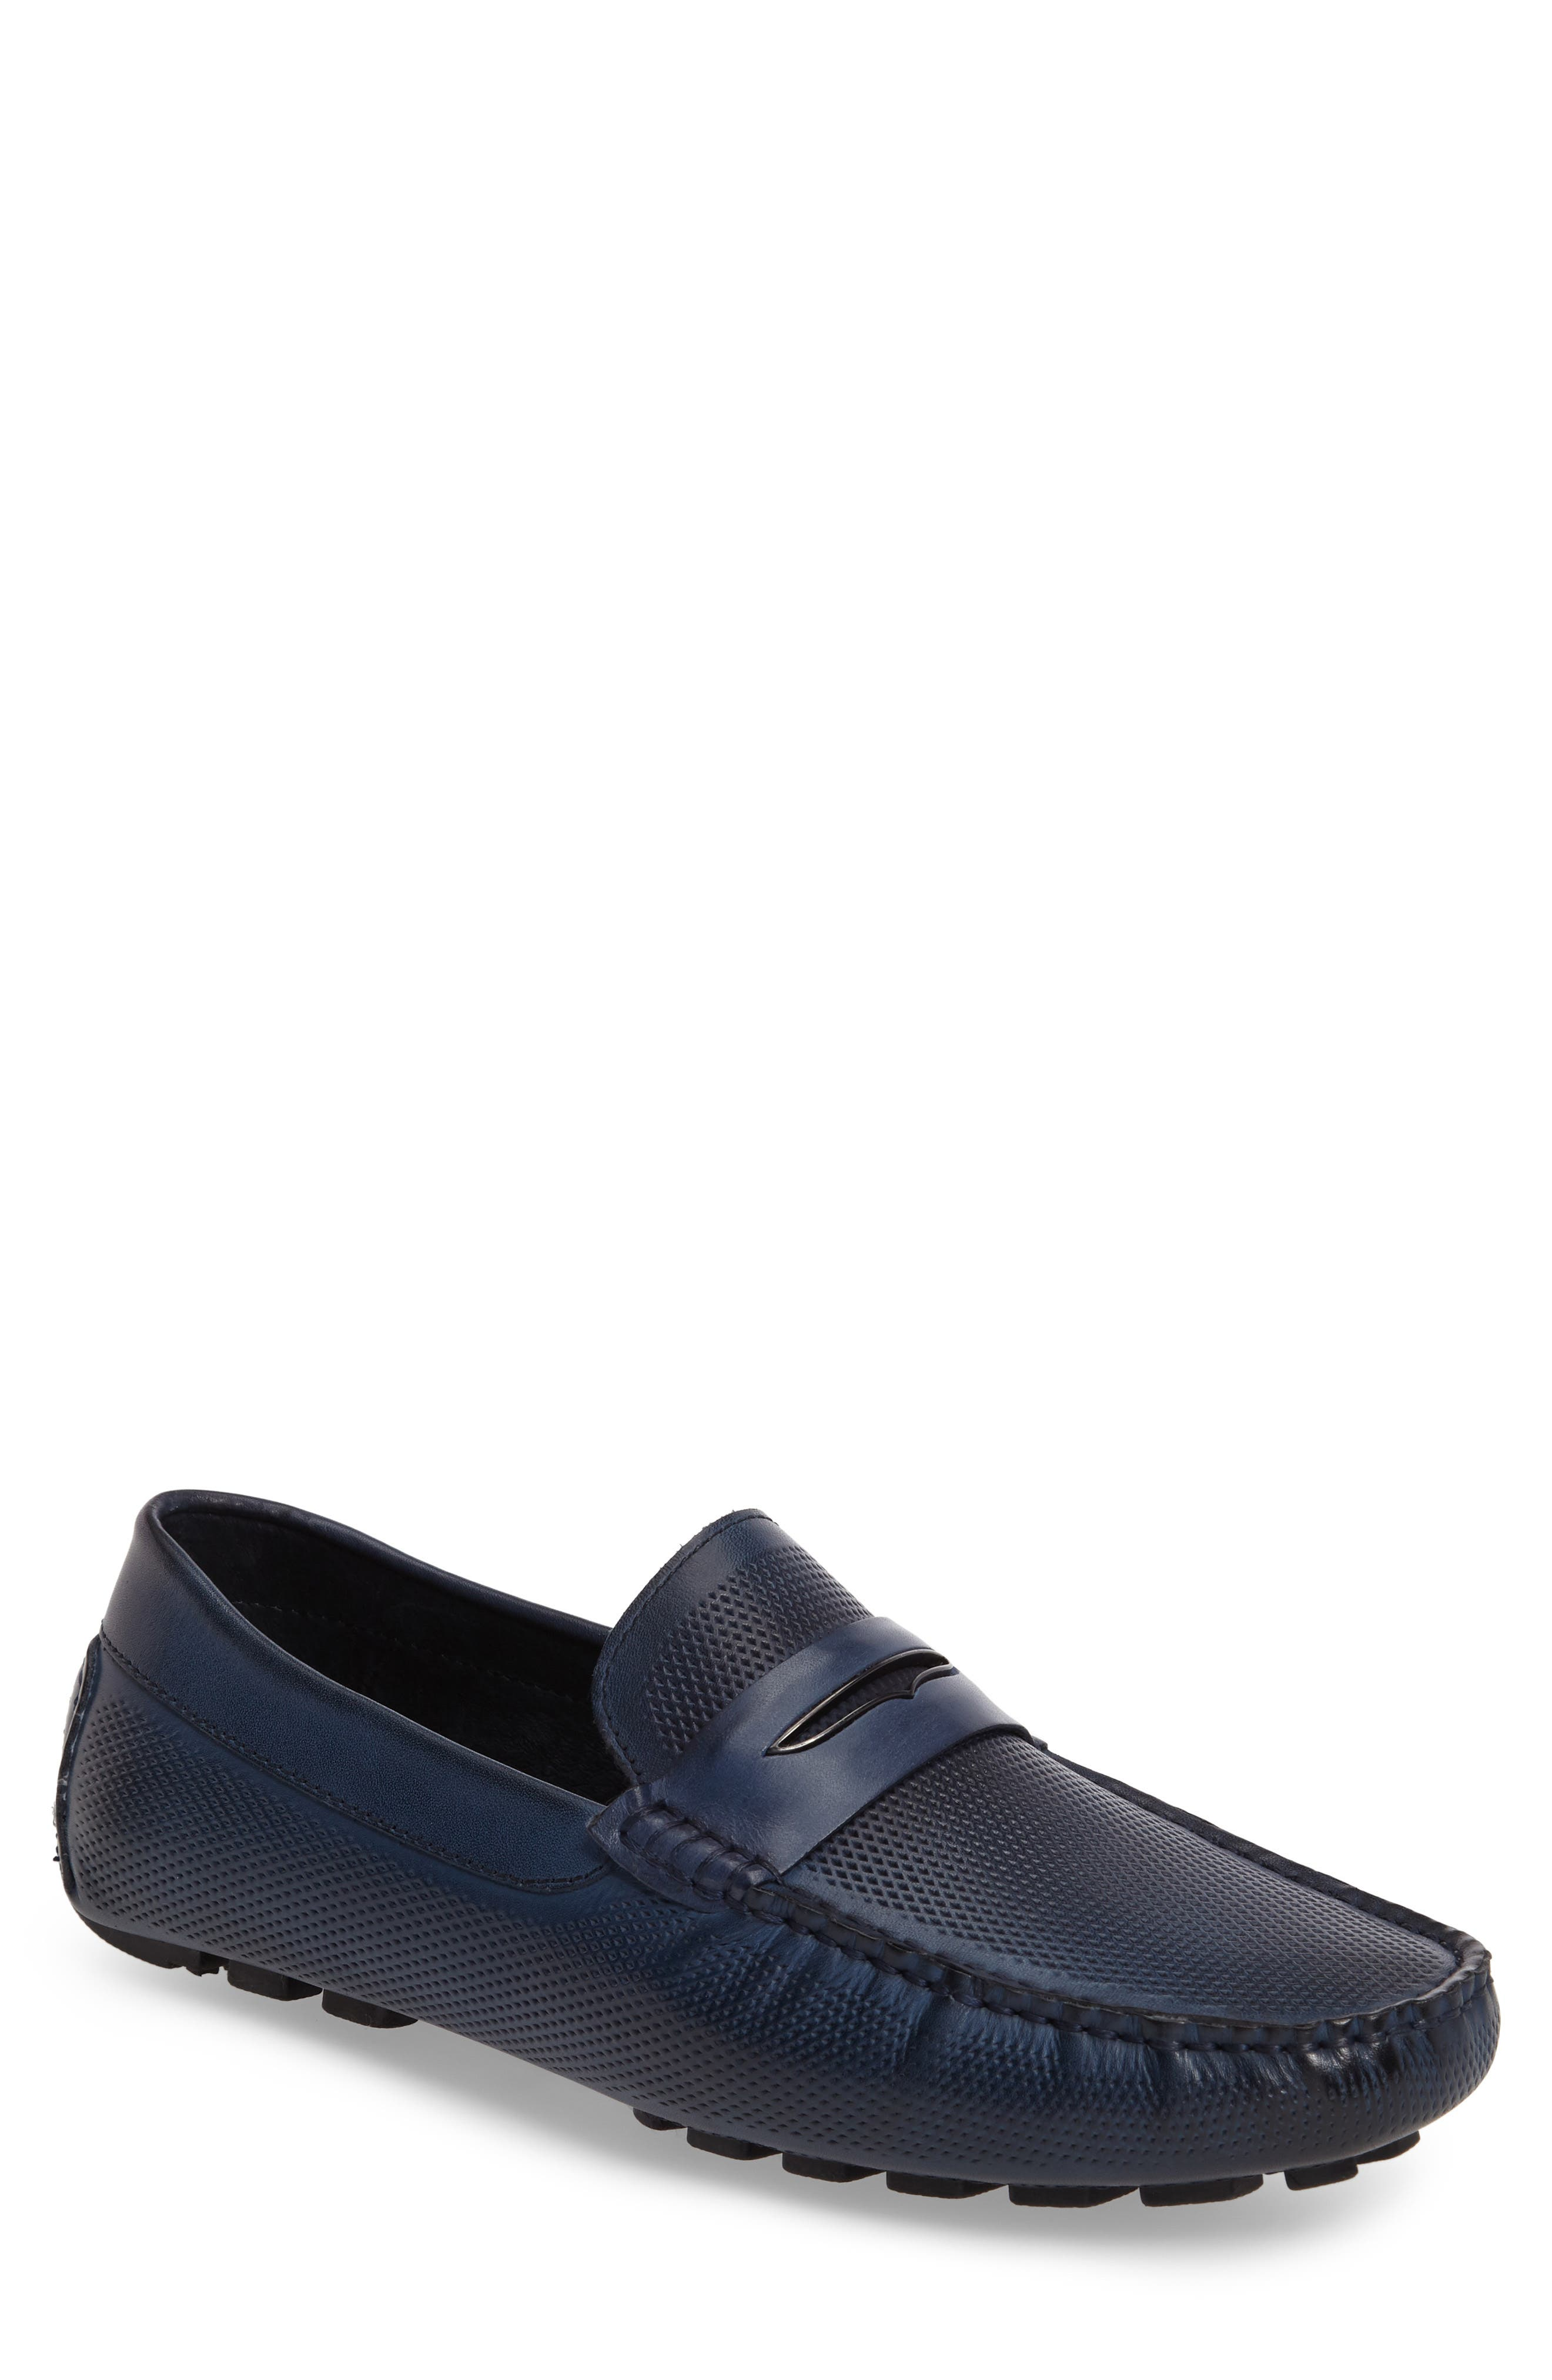 Zanzara Mondrian Driving Shoe (Men)